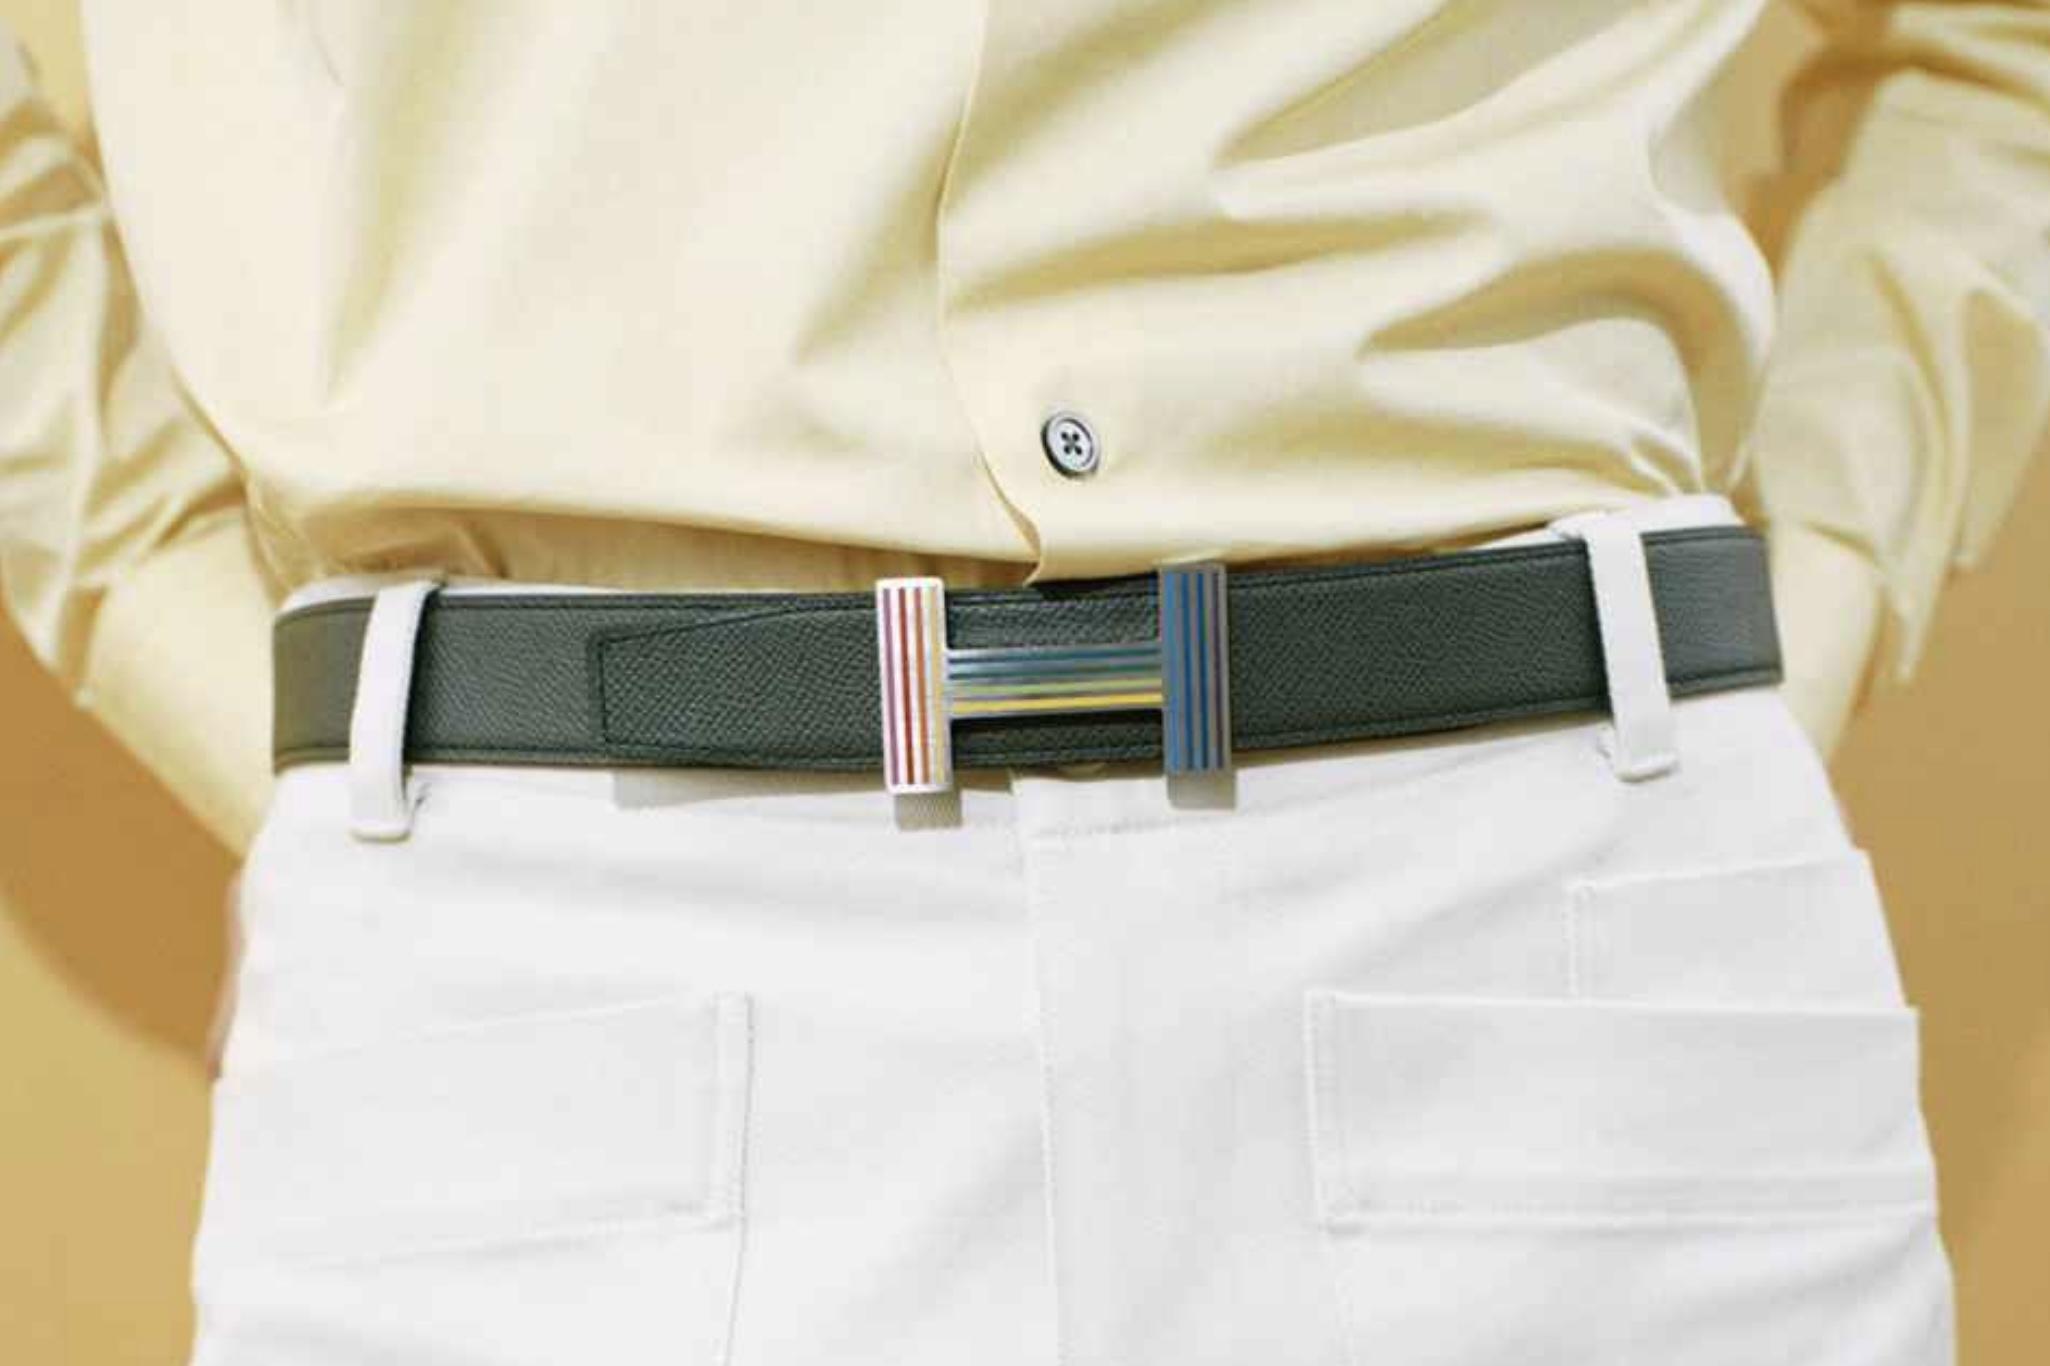 A fun men's belt buckle. Photo via Hermes.com.